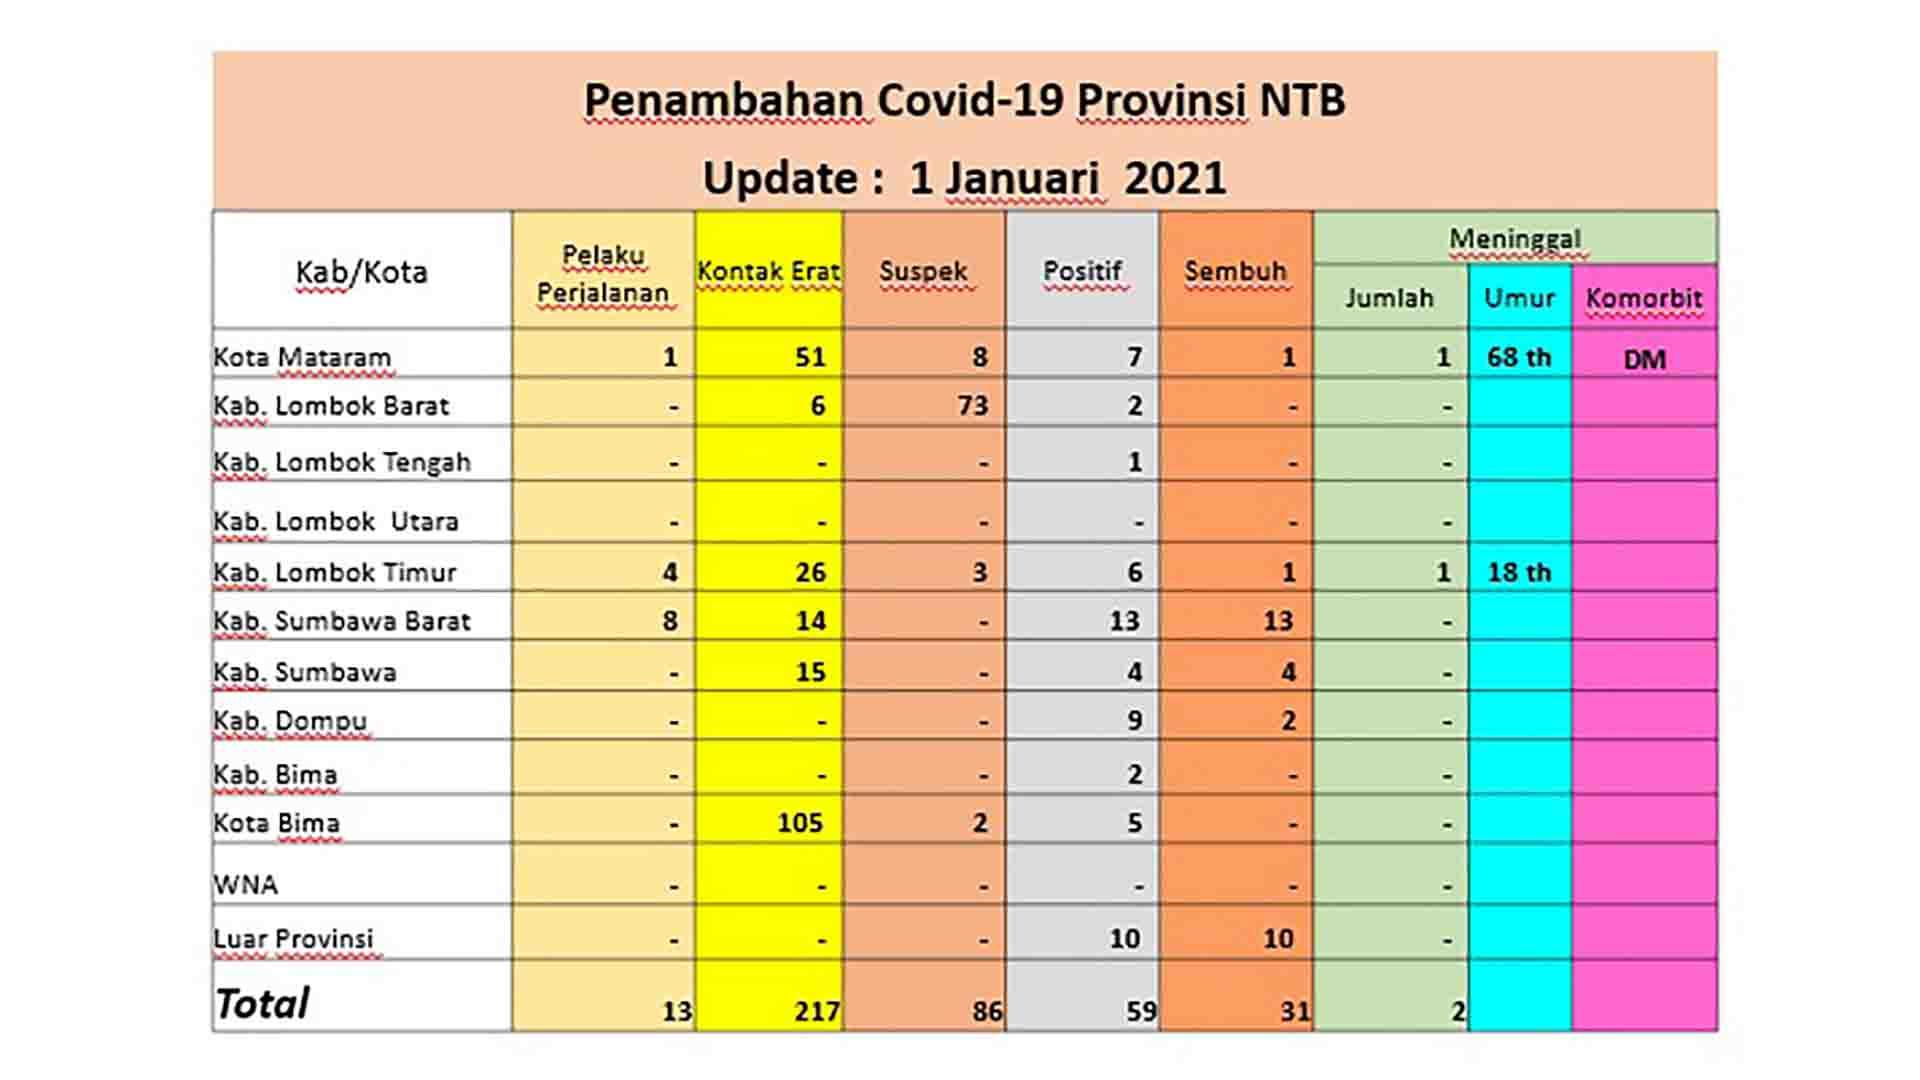 Tabel penambahan kasus Covid-19 di NTB, Jumat, 1 Januari 2021. (Sumber : Dinas Kesehatan NTB)